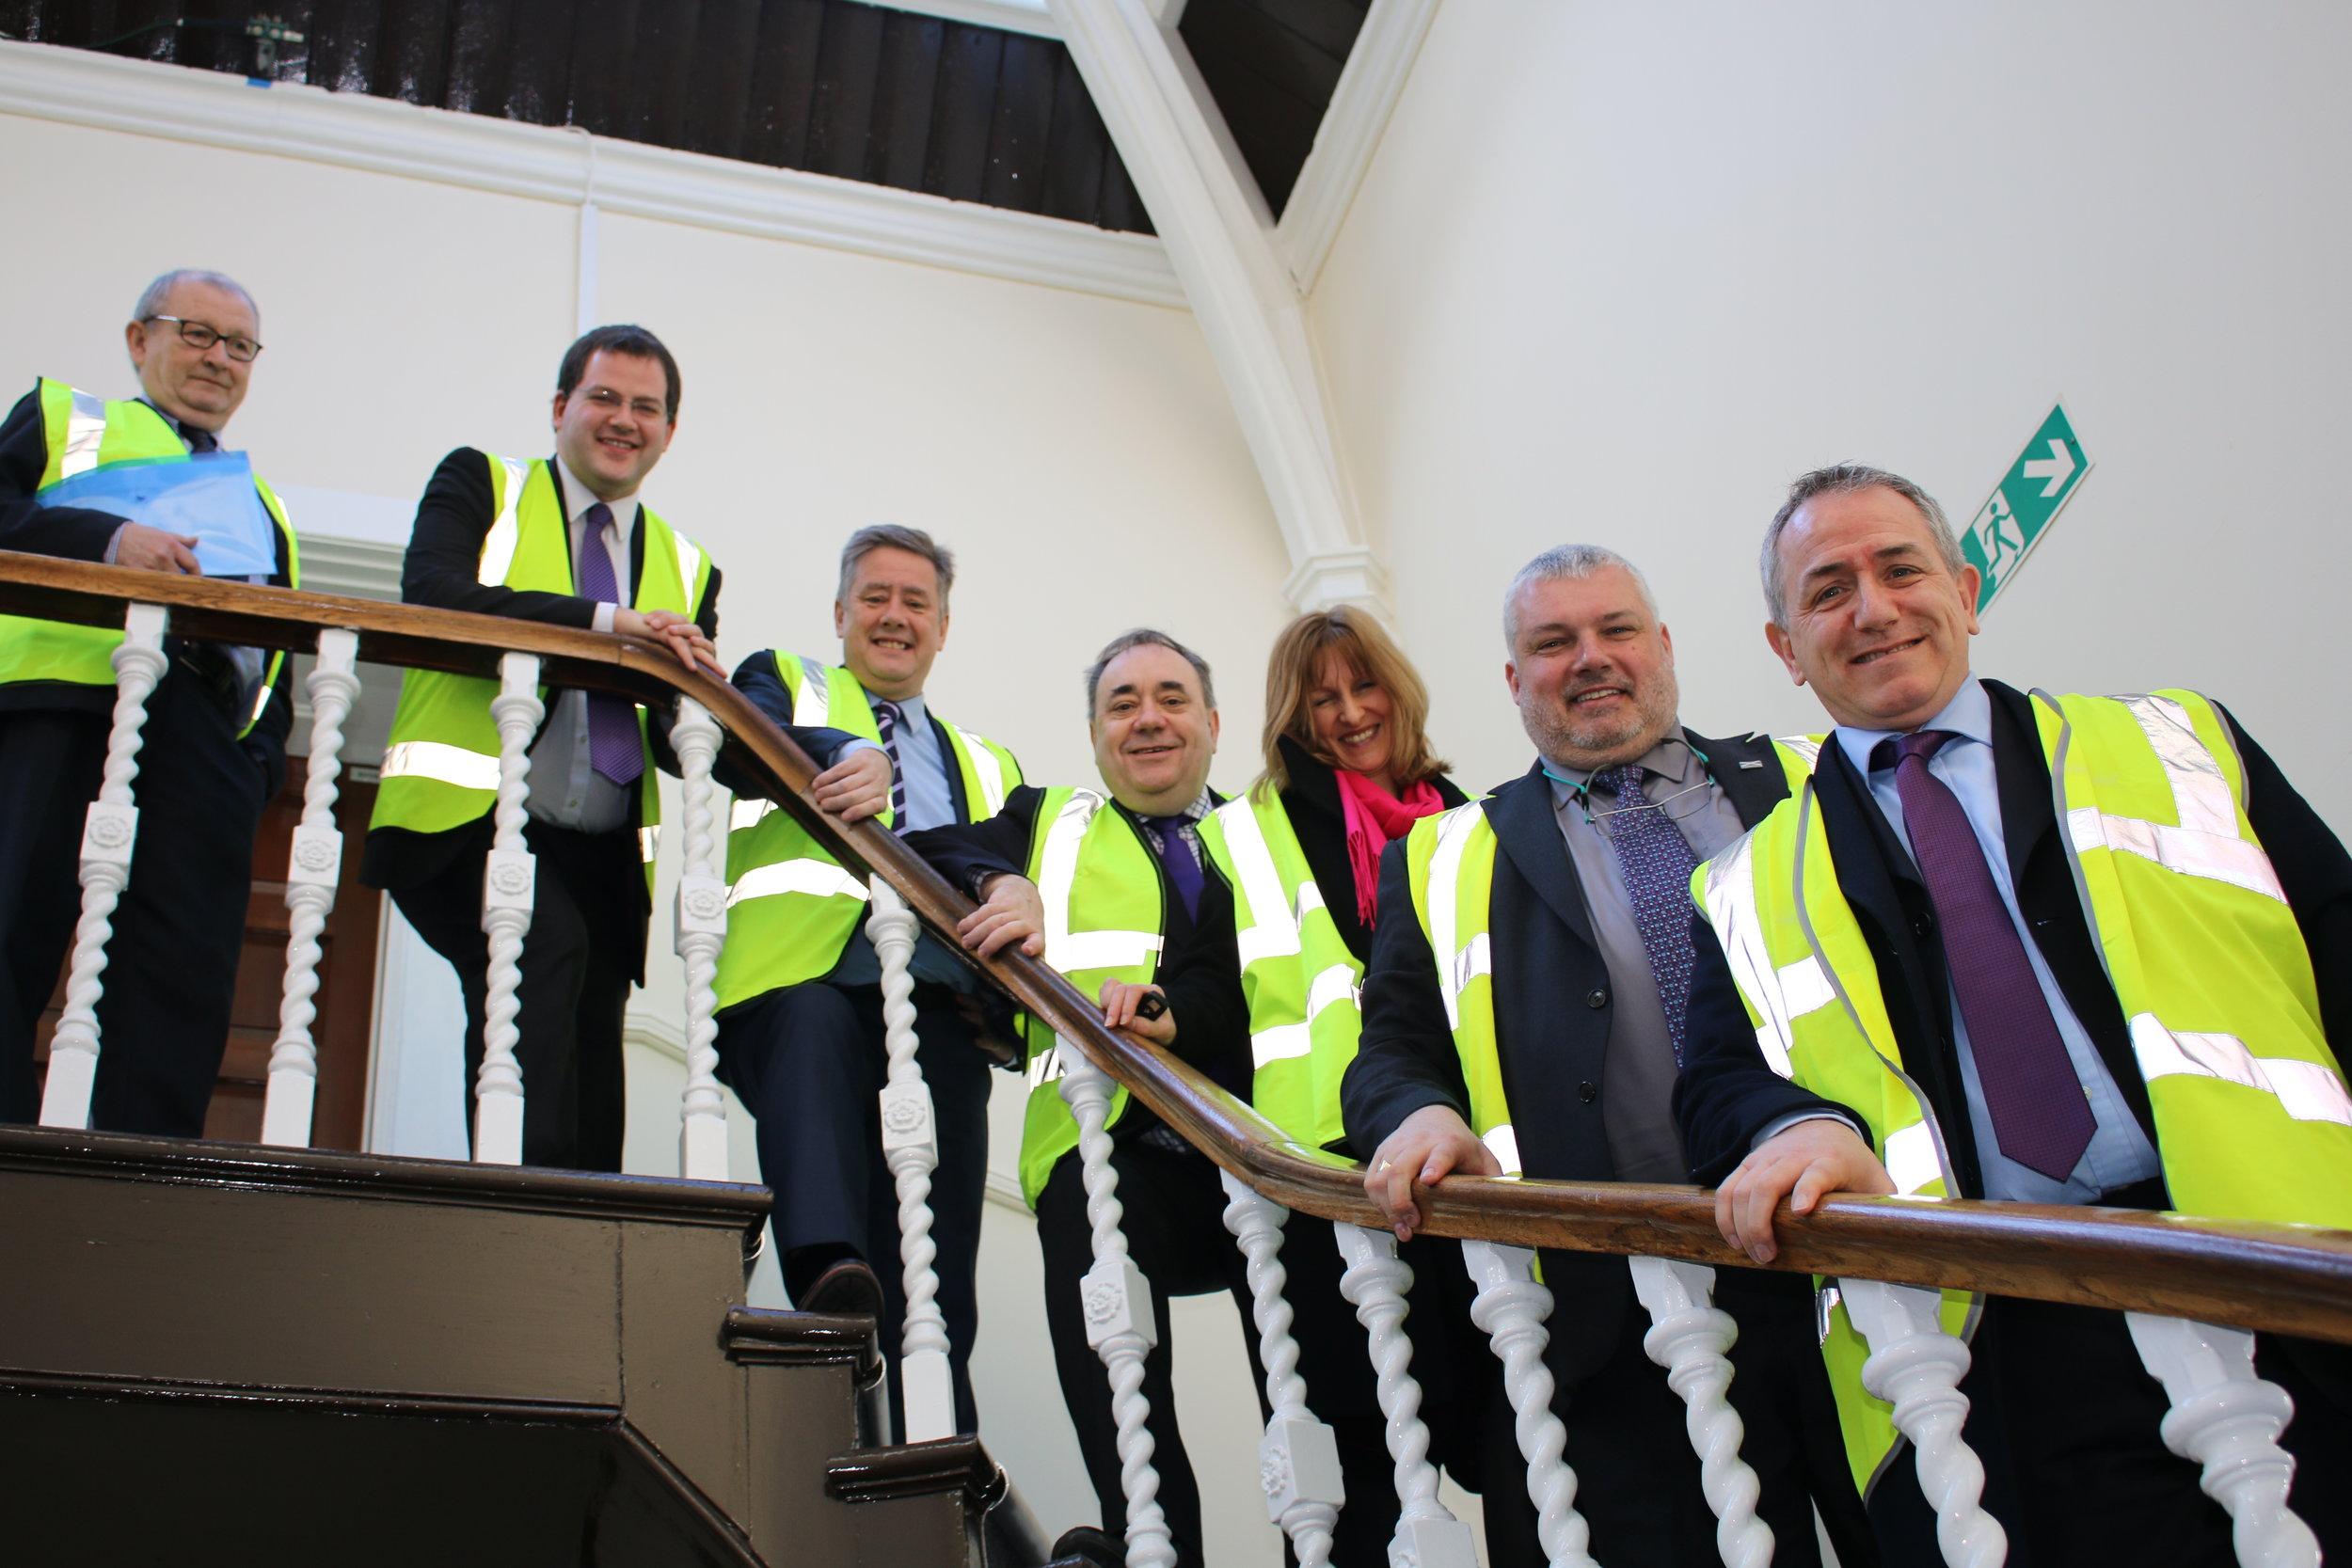 Meeting at Stoneywood Mill. From left: Mark McDonald MSP, Keith Brown MSP, Alex Salmond MP, Anke Heggie, Angus MacSween, Jonathan Mitchell